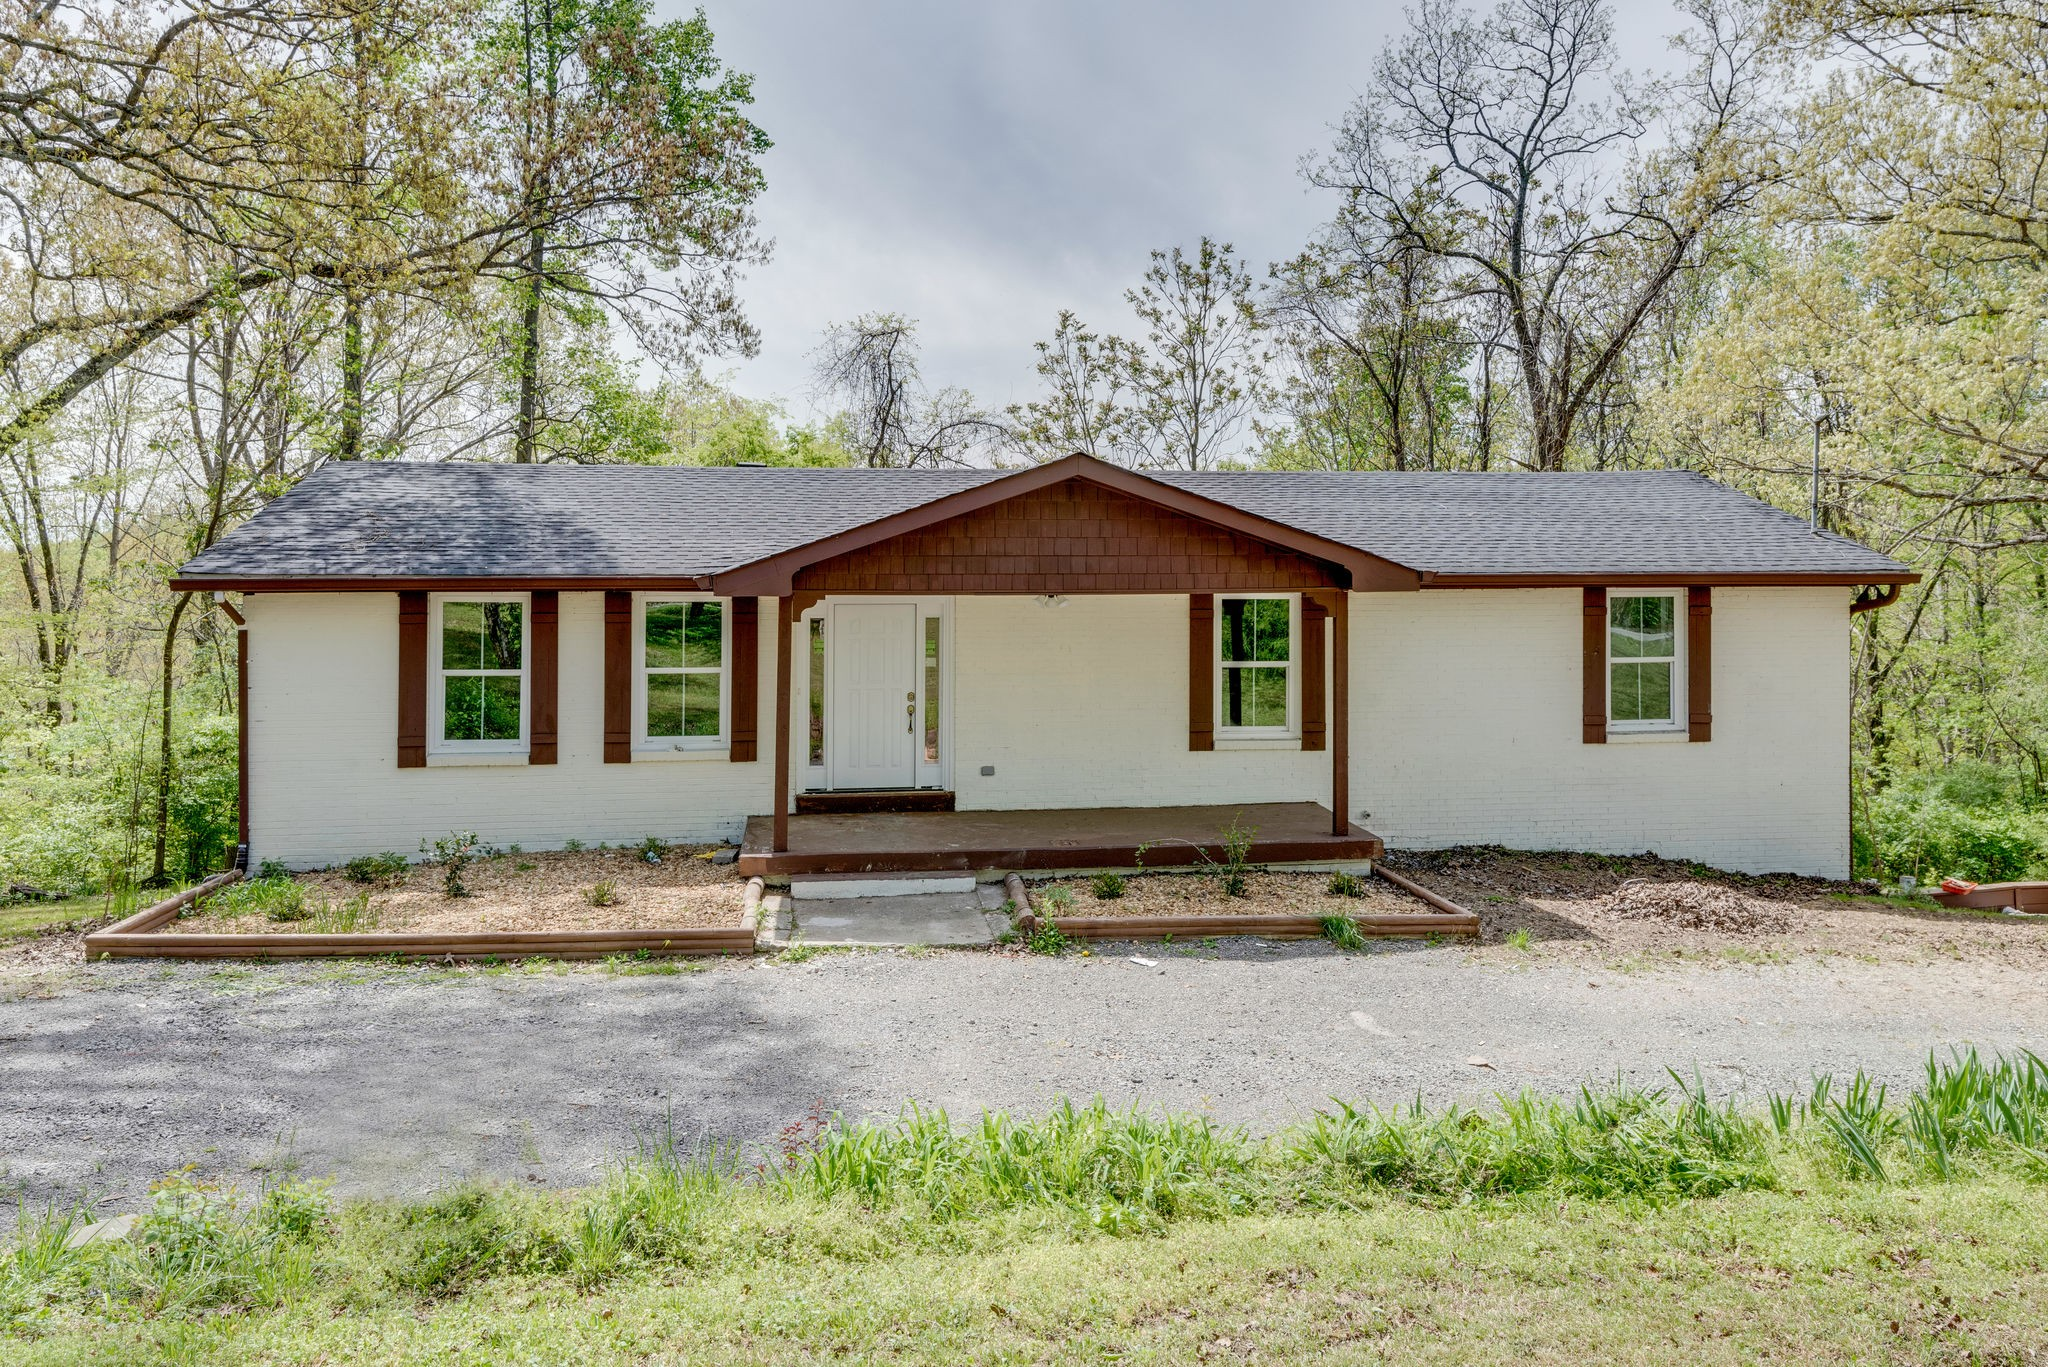 8517 Old Charlotte Pk Property Photo - Pegram, TN real estate listing